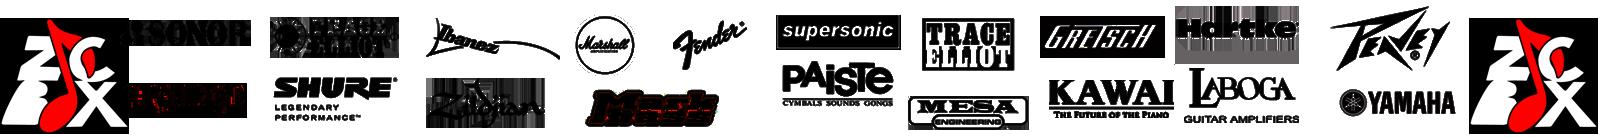 Marshall-ivanez-trace elliot-shure-capelle-orange-sonor-zildjian-mark bass-fender-supersonic-paiste-mesa-gretsch-kawai-hartke-laboga-peavey-laboga-zicbox